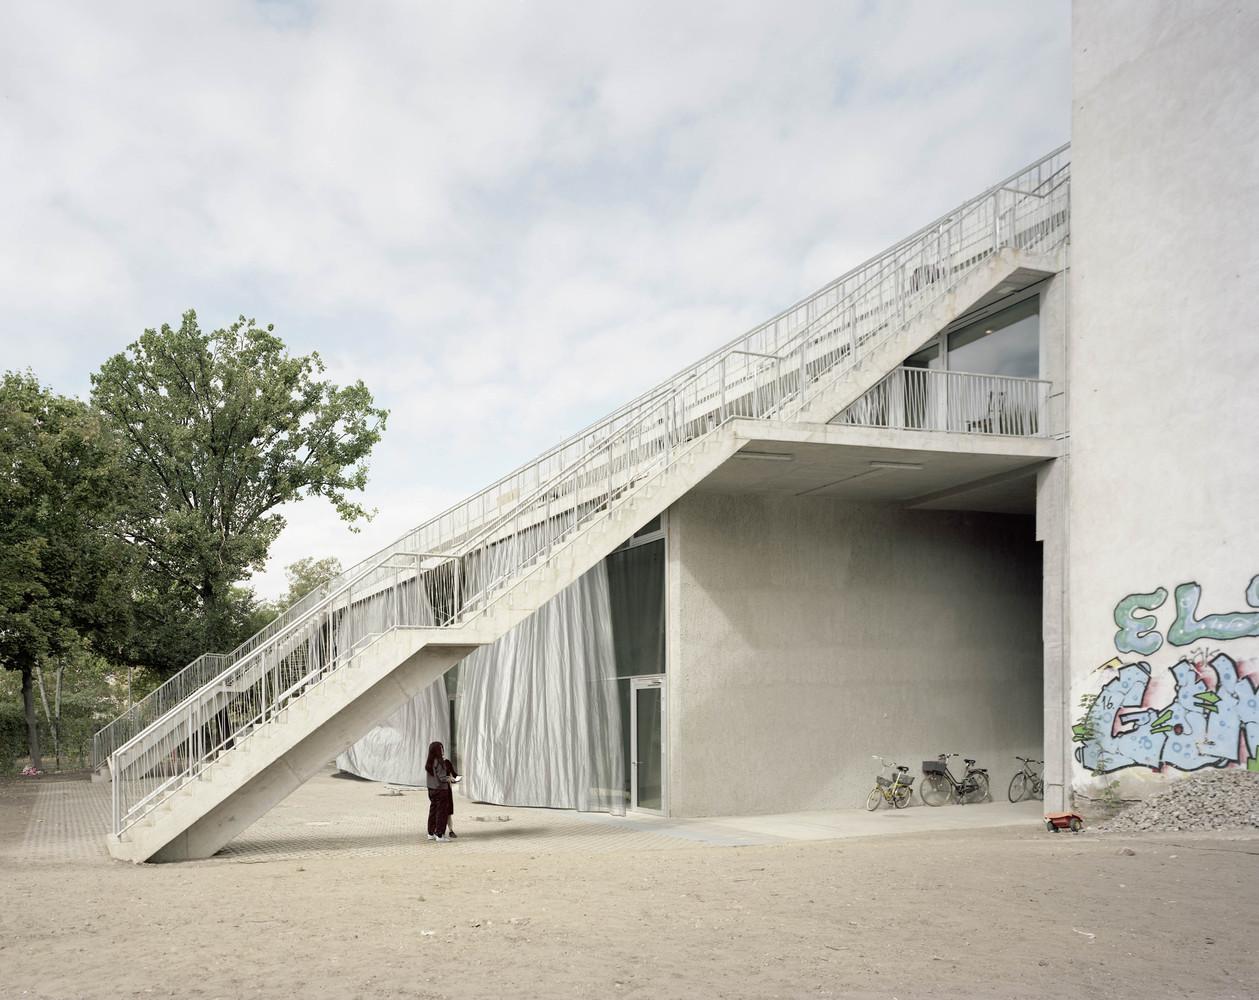 Gallery Of Terrassenhaus Berlin Brandlhuber Emde Burlon Muck